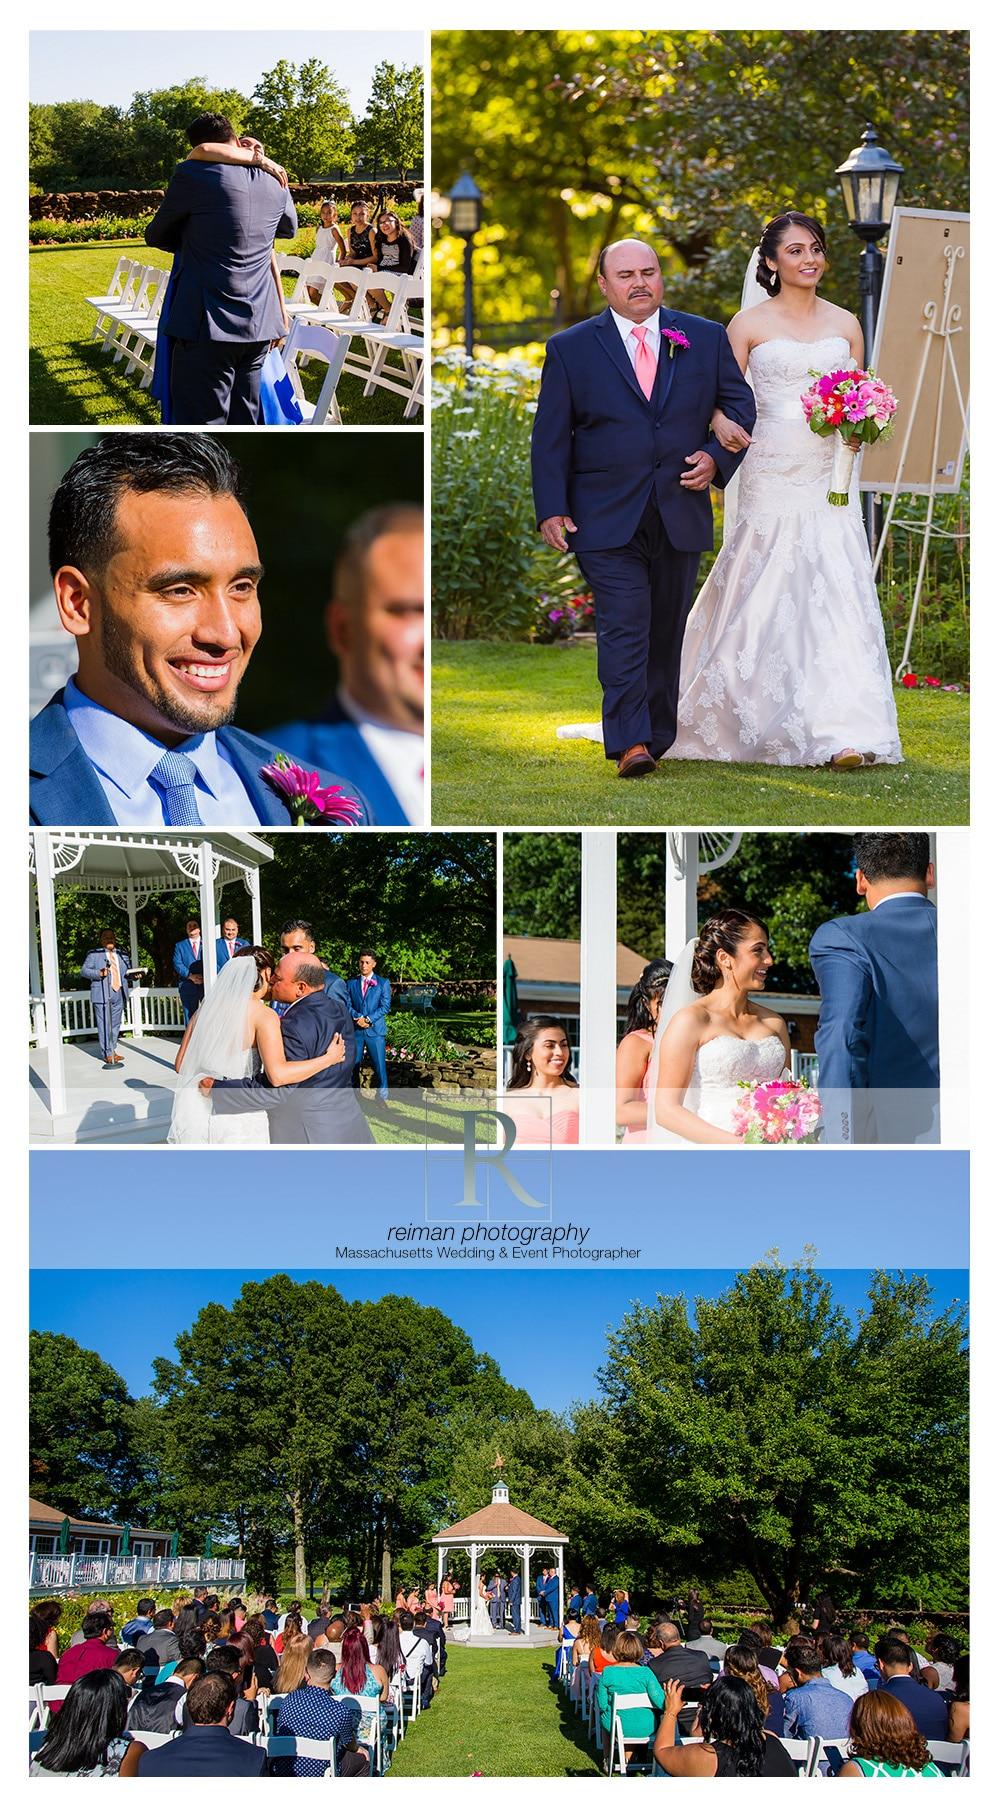 Independence Harbor, Wedding, June, Reiman Photography